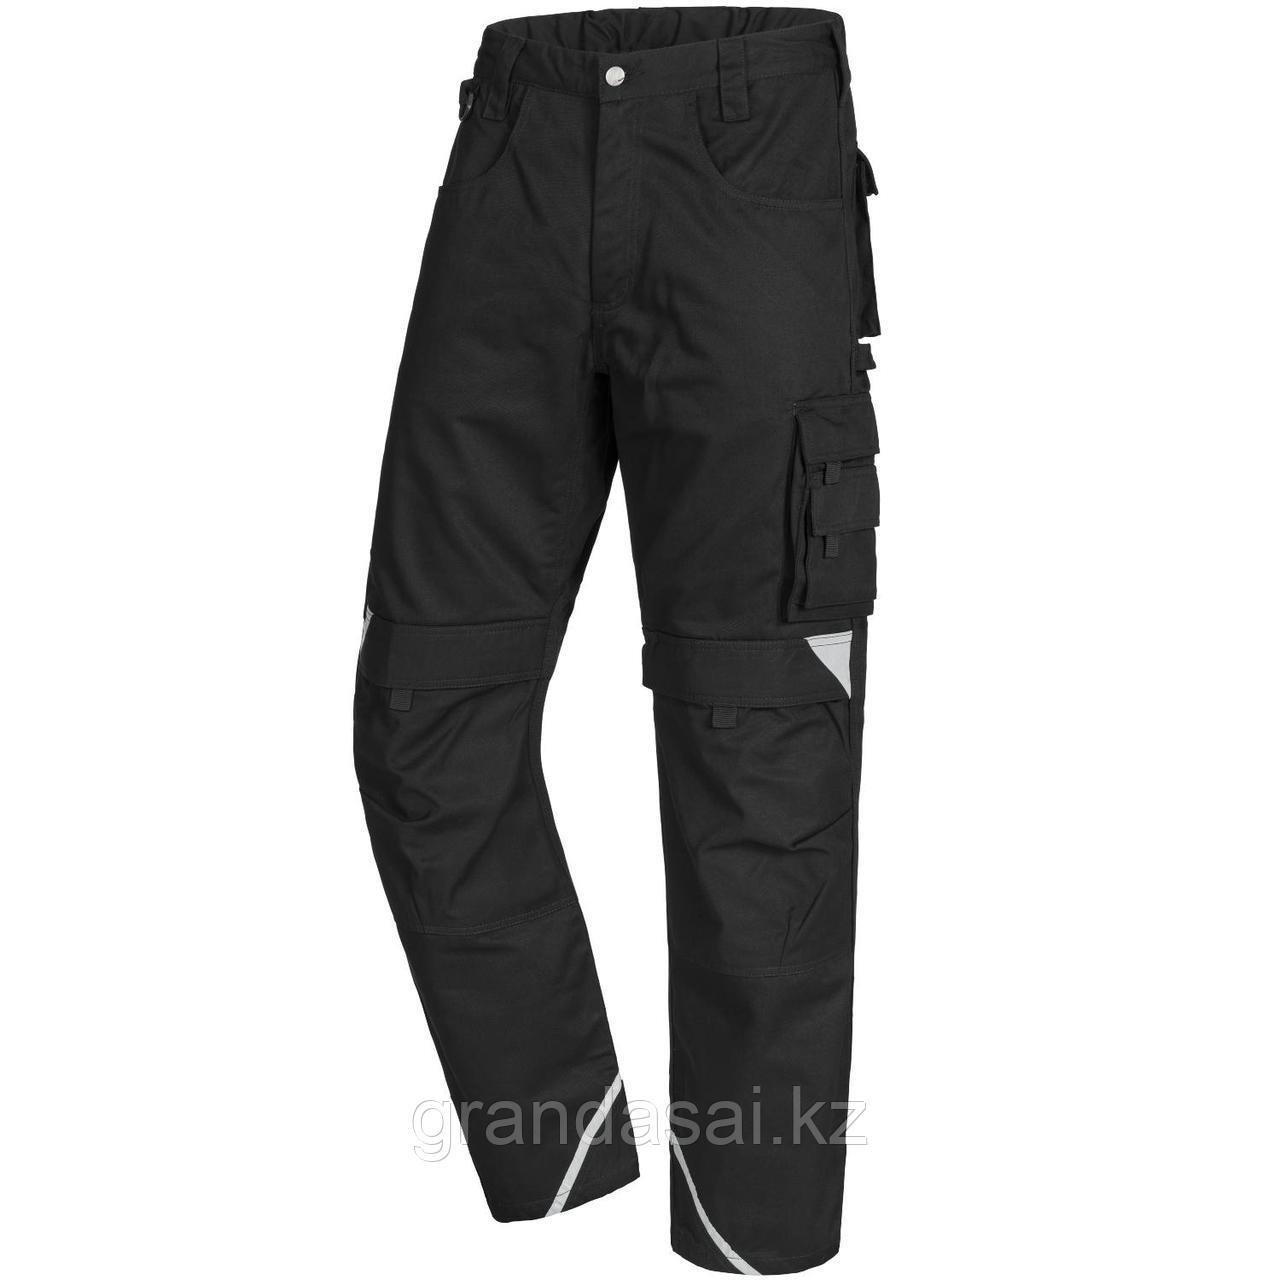 Рабочие брюки NITRAS 7610 MOTION TEX PLUS